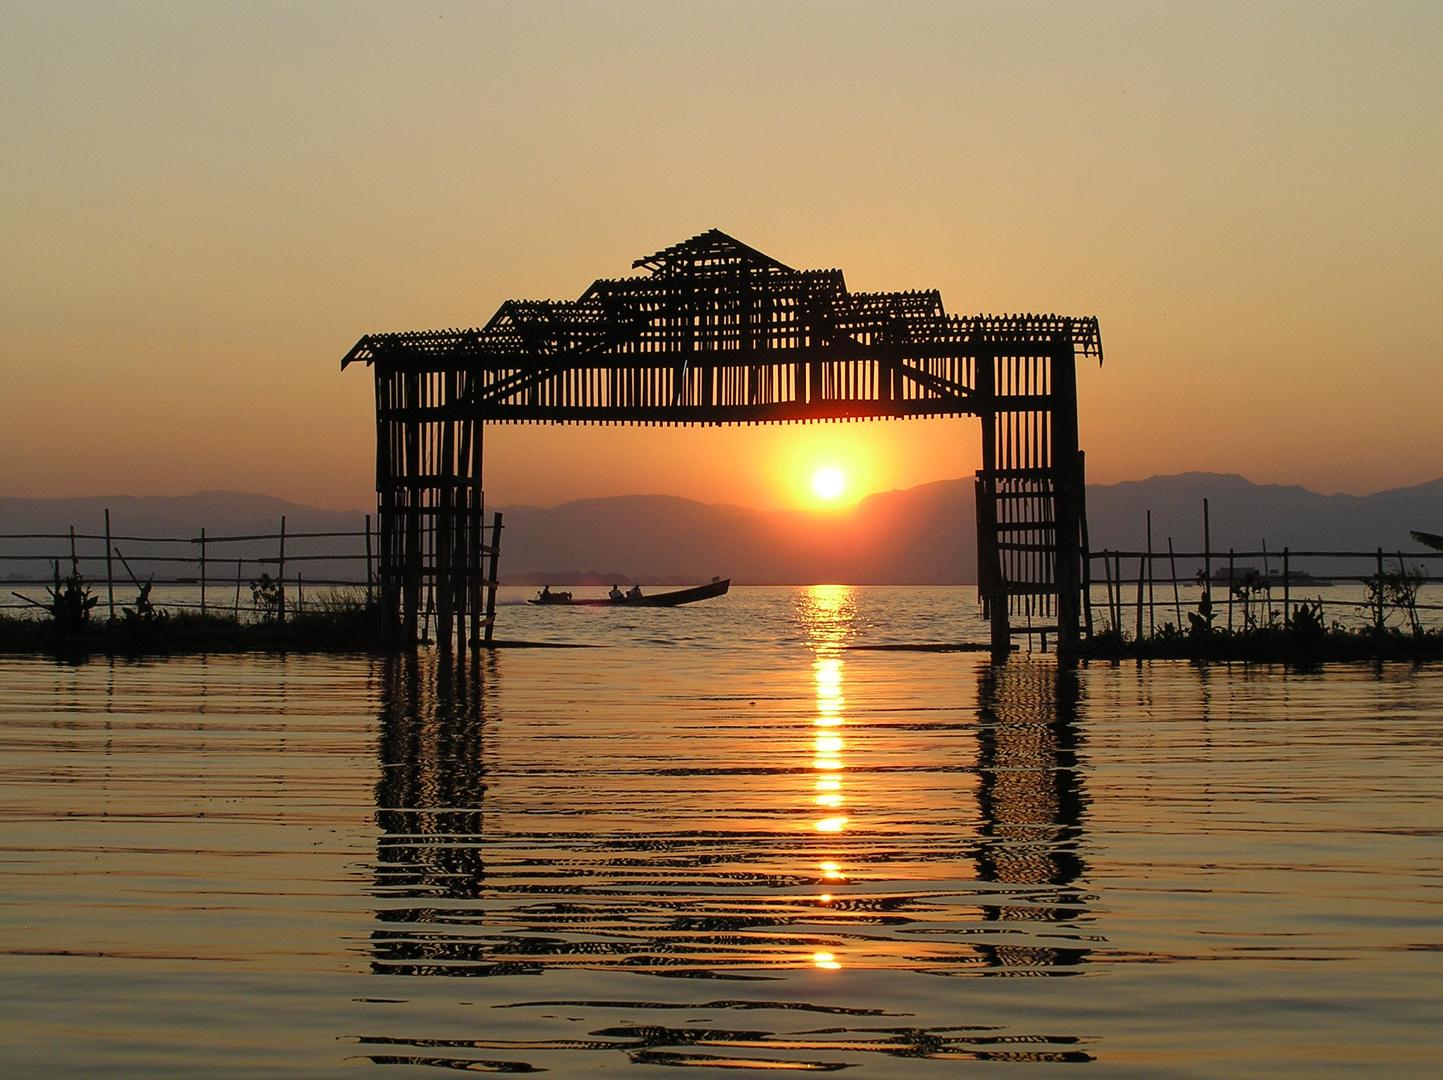 Sonnenuntergang am Inlesee in Burma